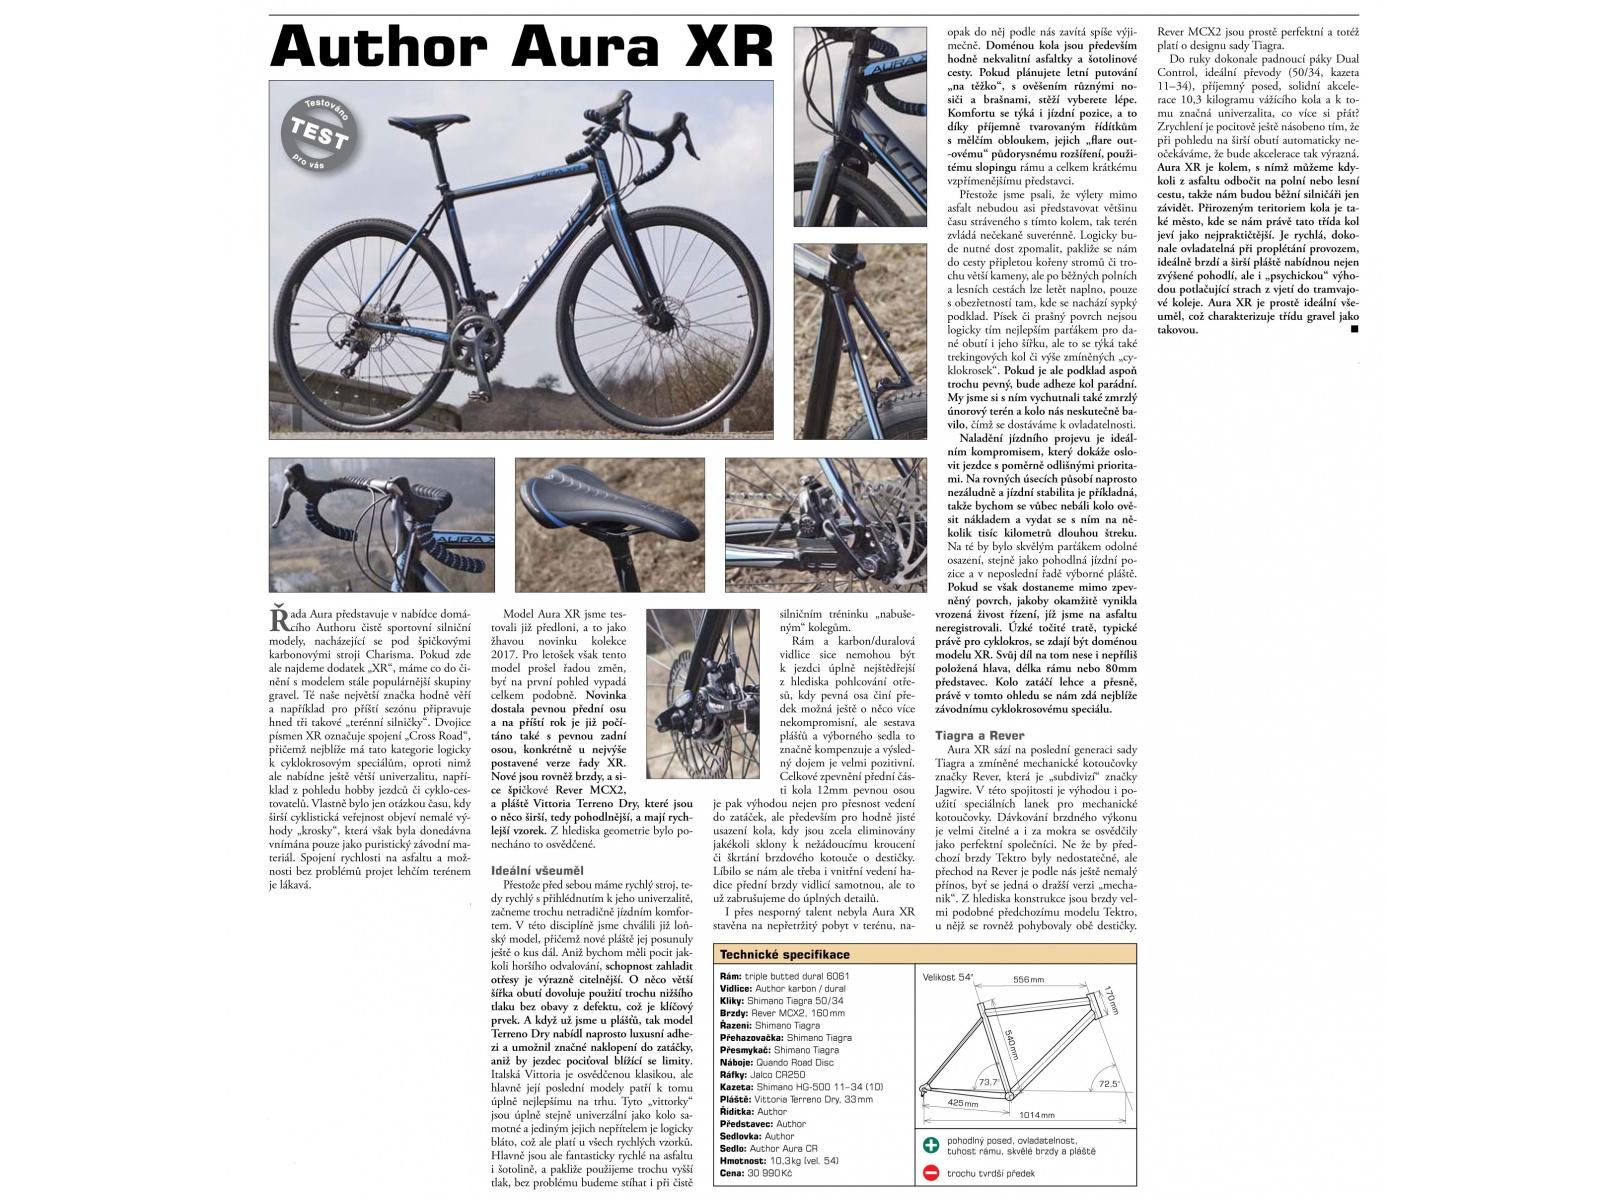 AUTHOR Aura XR 2018 - tripple butted alloy frame